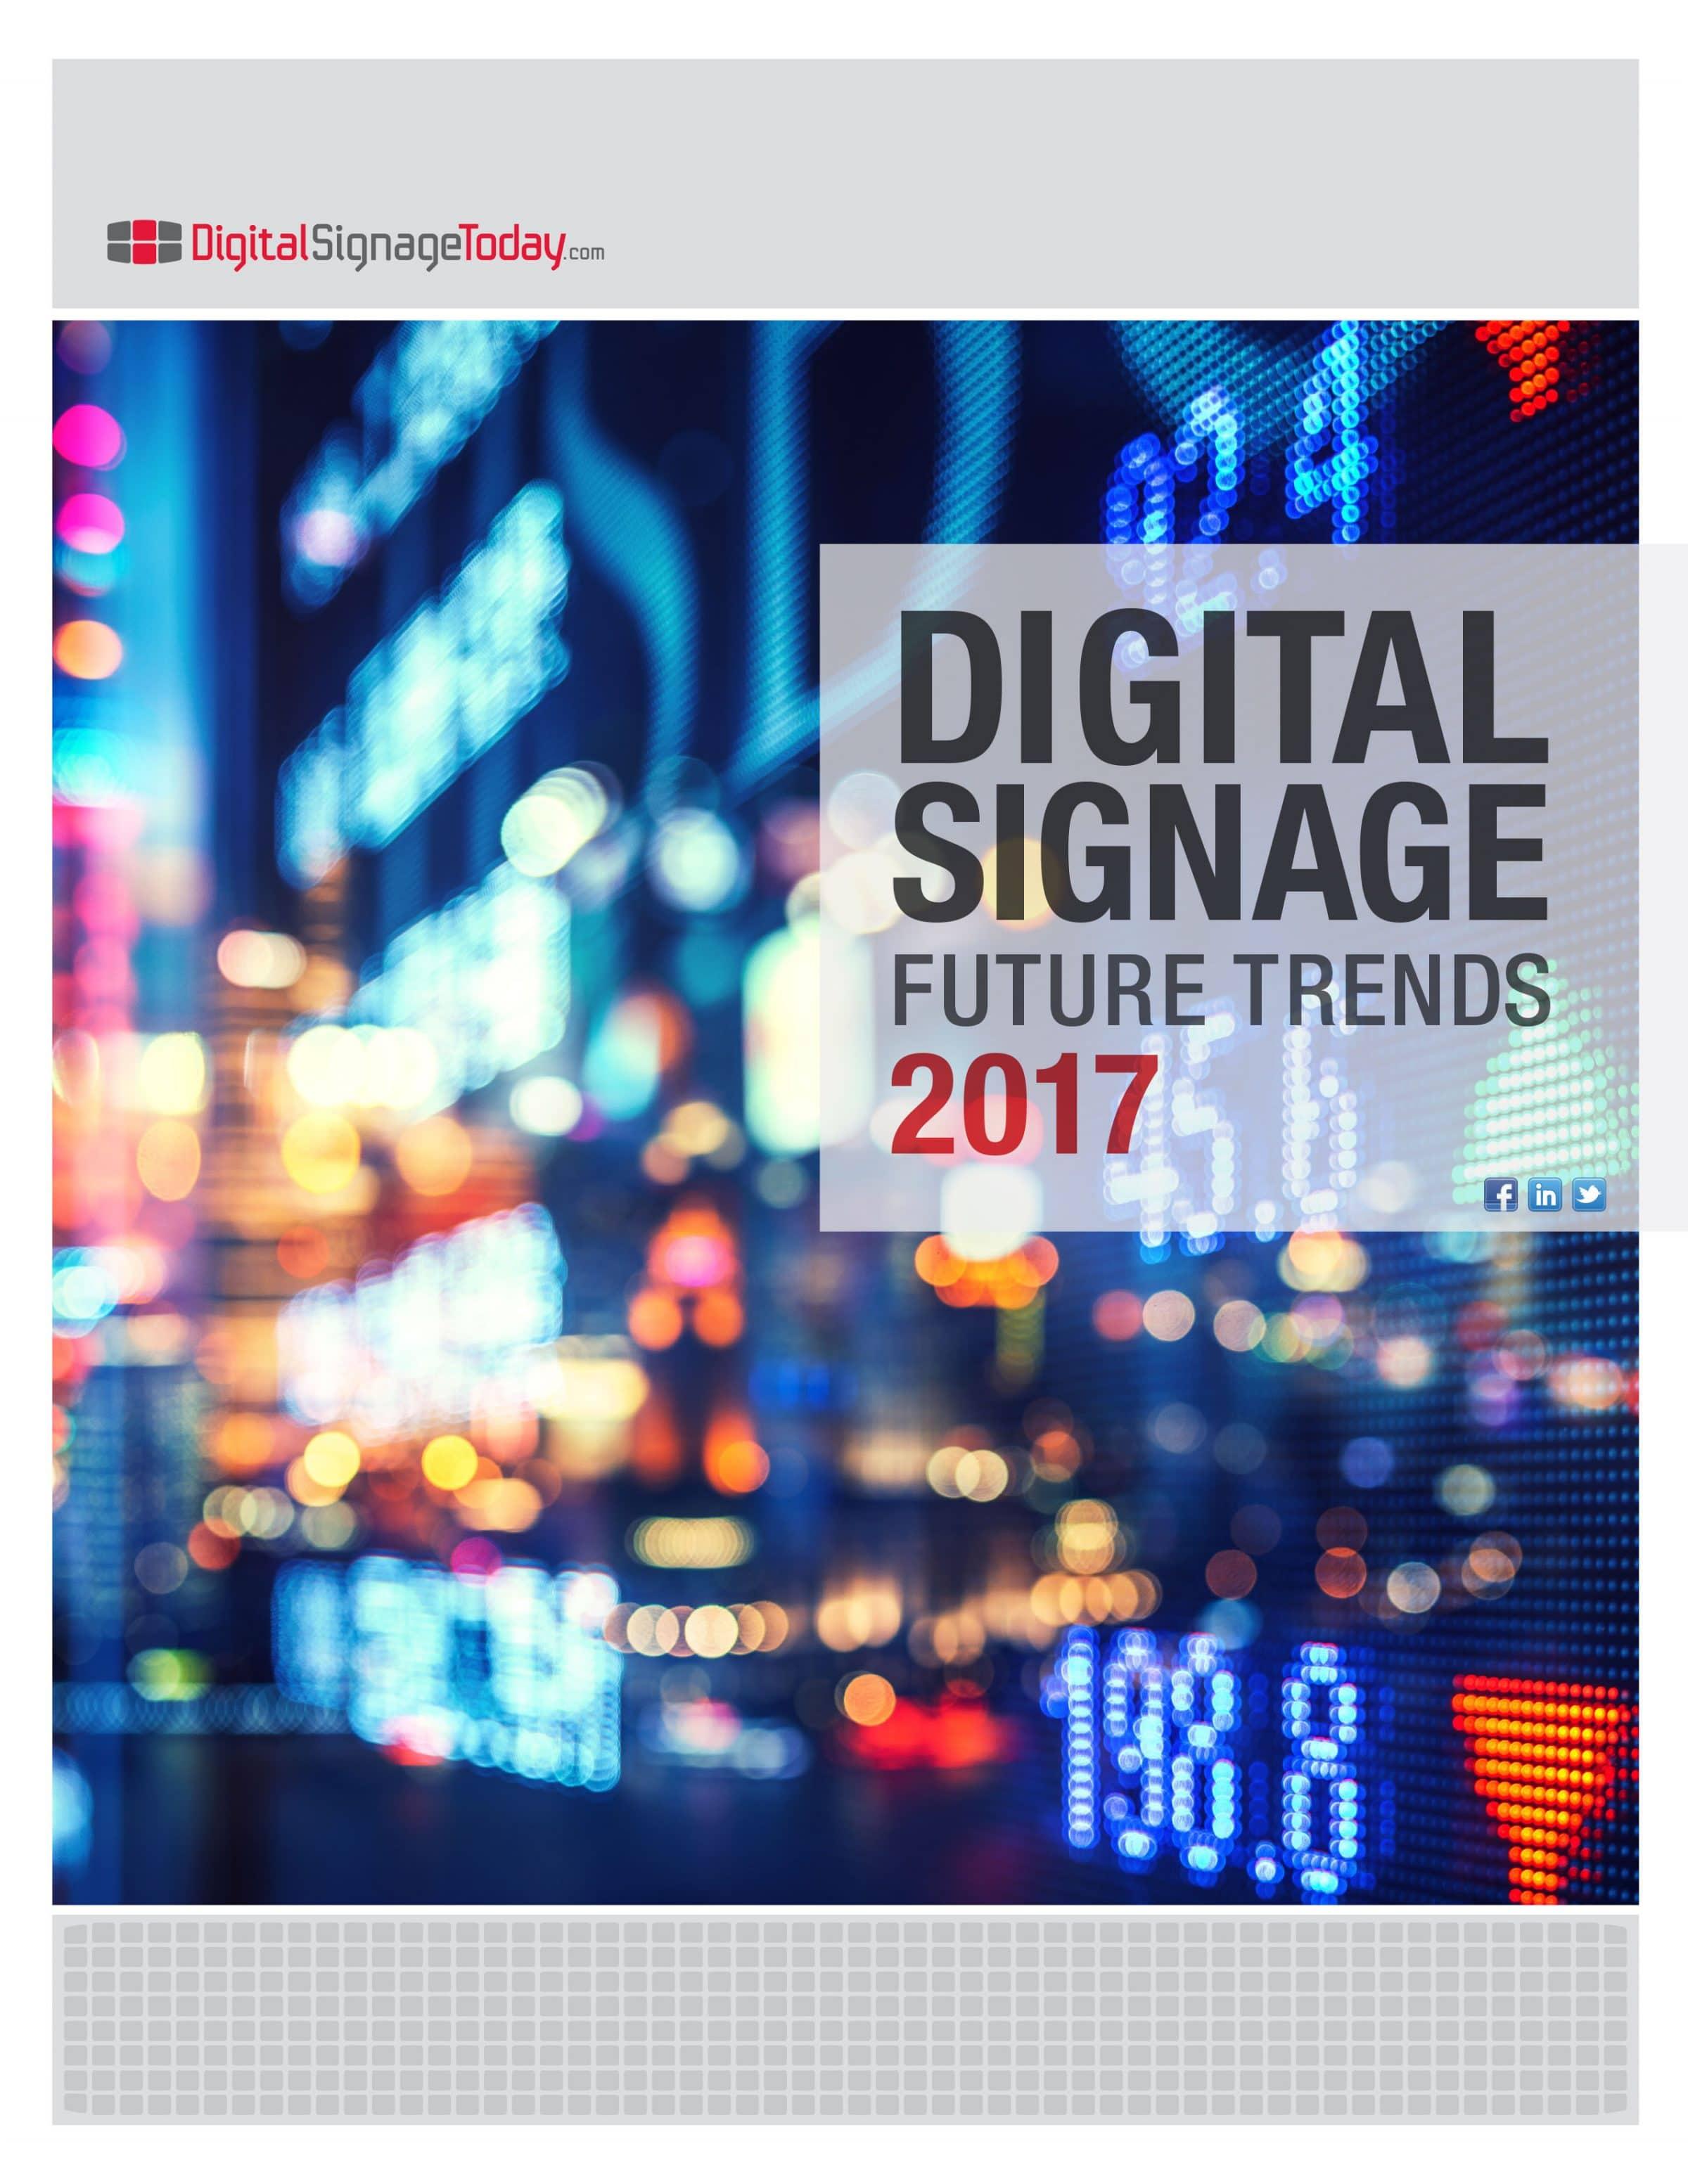 2017 Digital Signage Future Trends